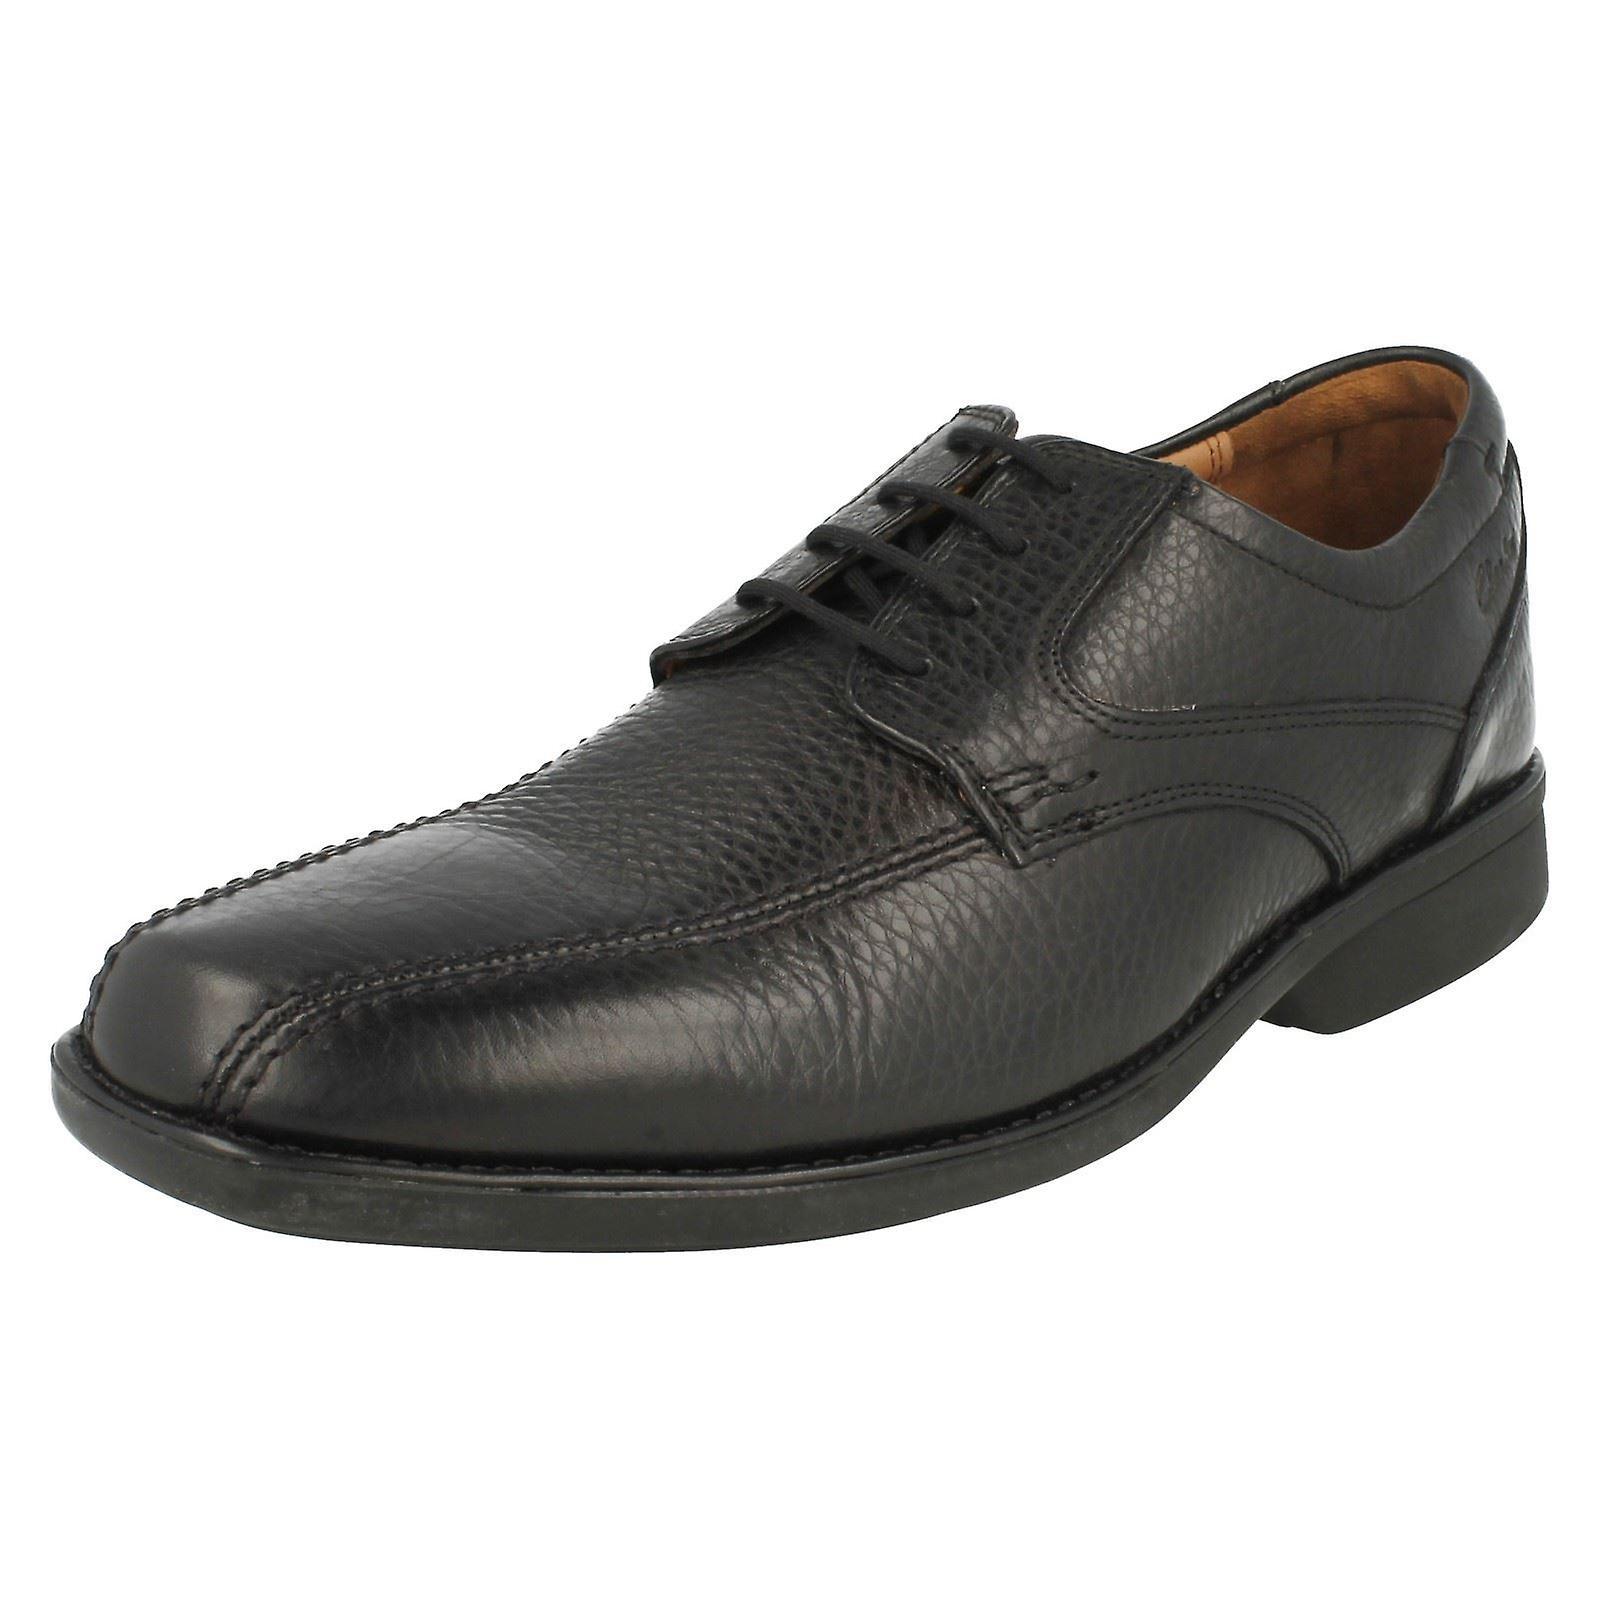 retro online sale delicate colors Mens Clarks Formal Lace Up Shoes Foot Soft